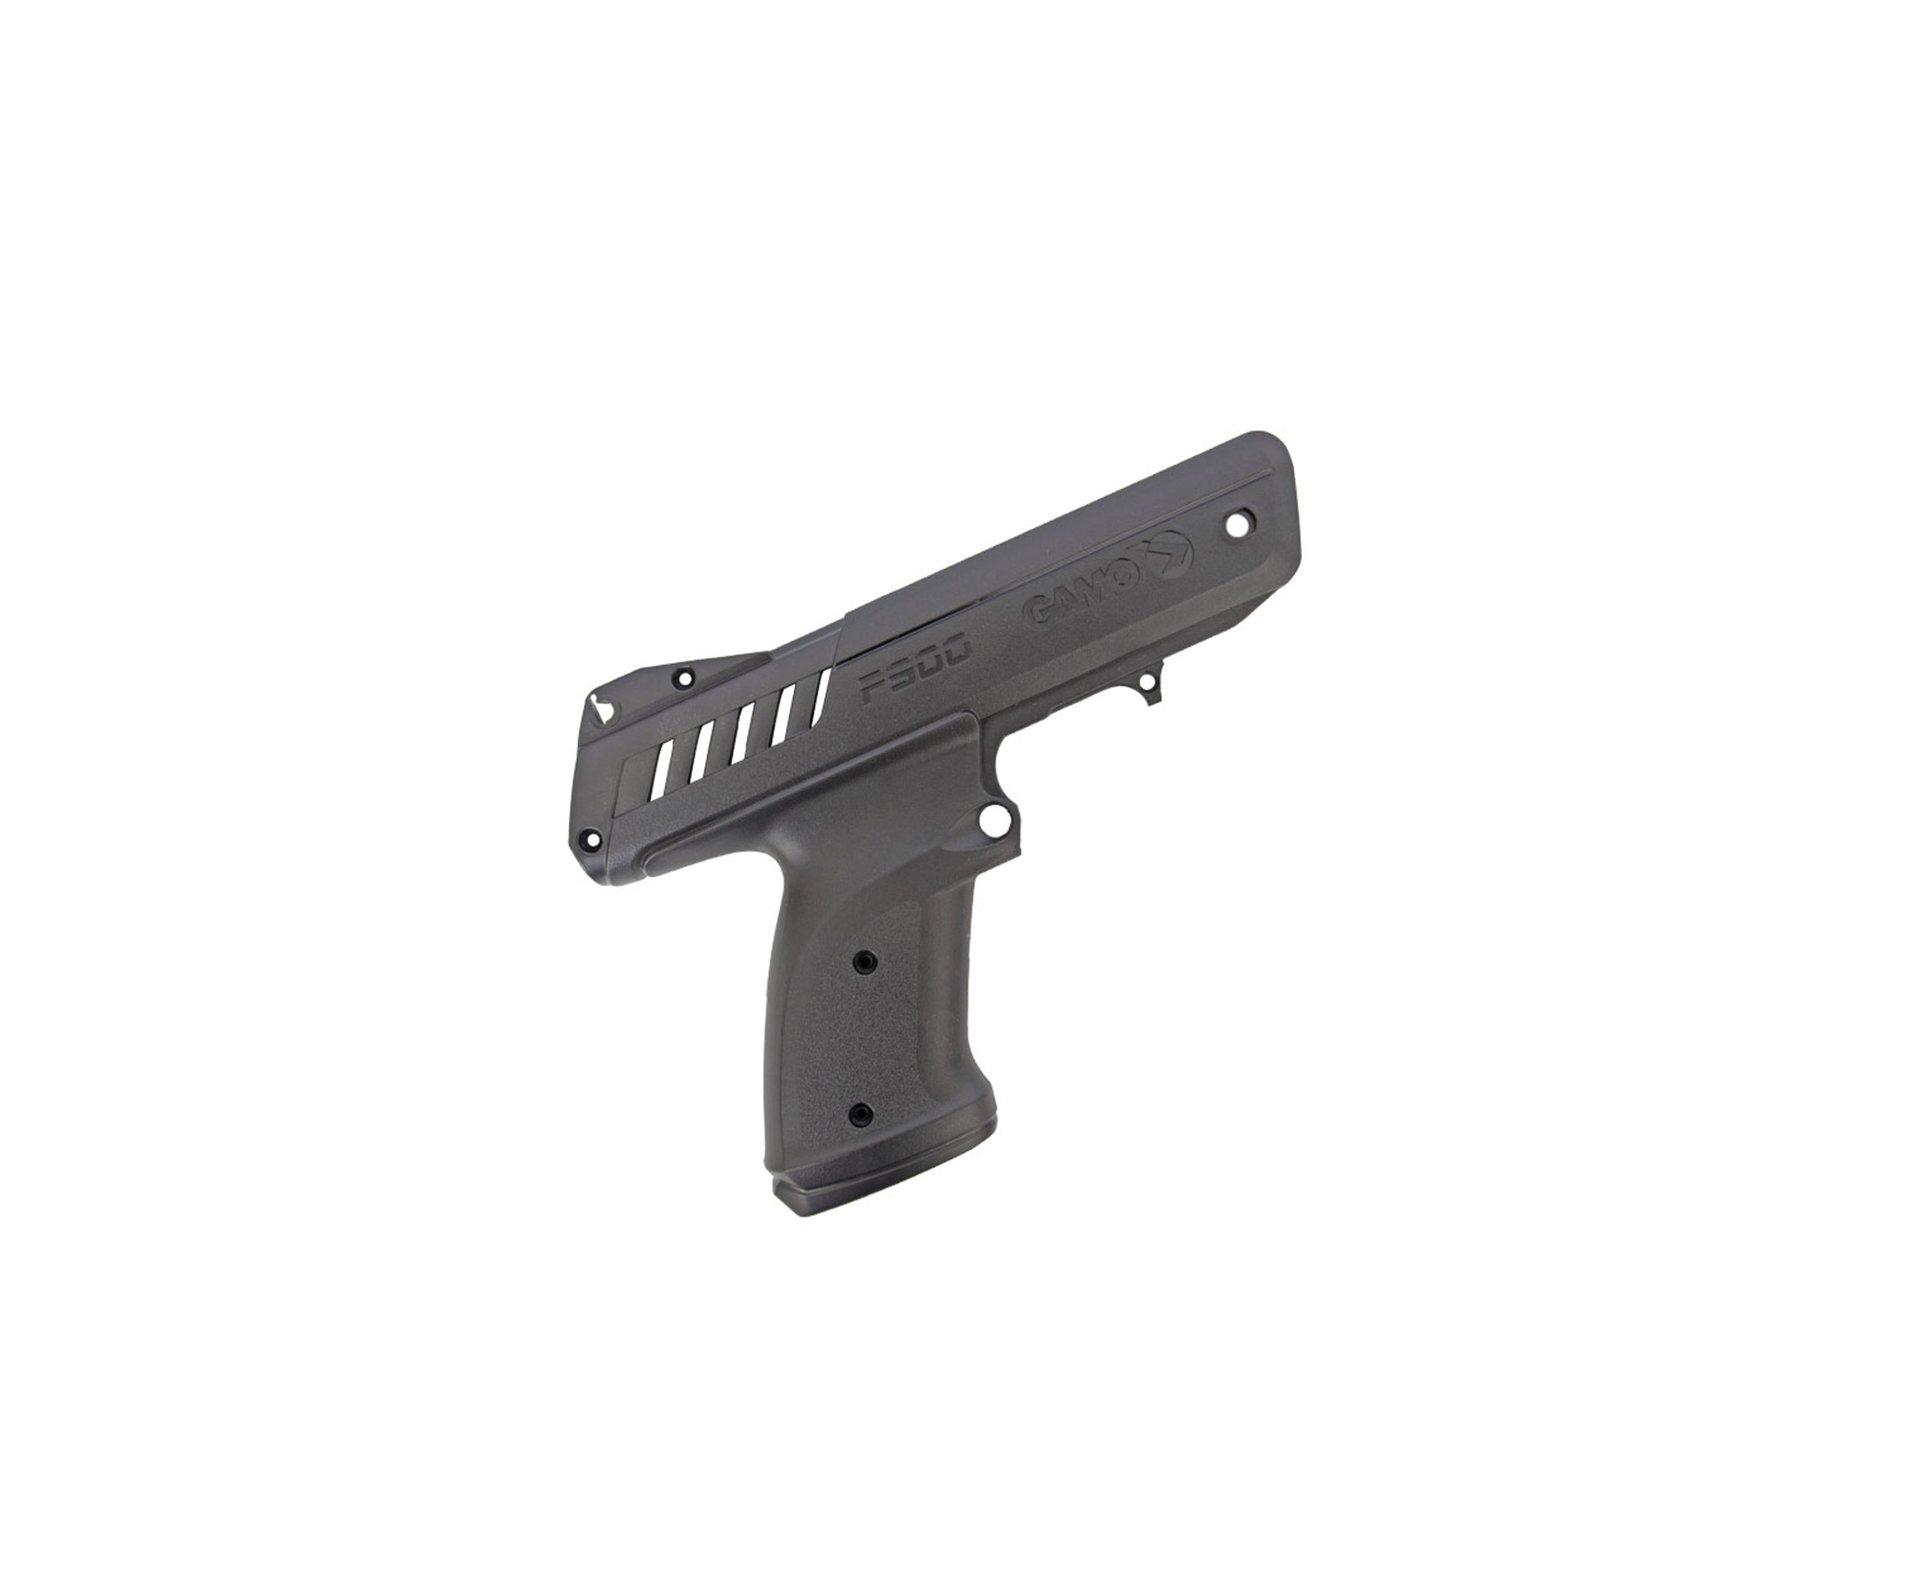 Empunhadura Direita Pistola P900 Gamo